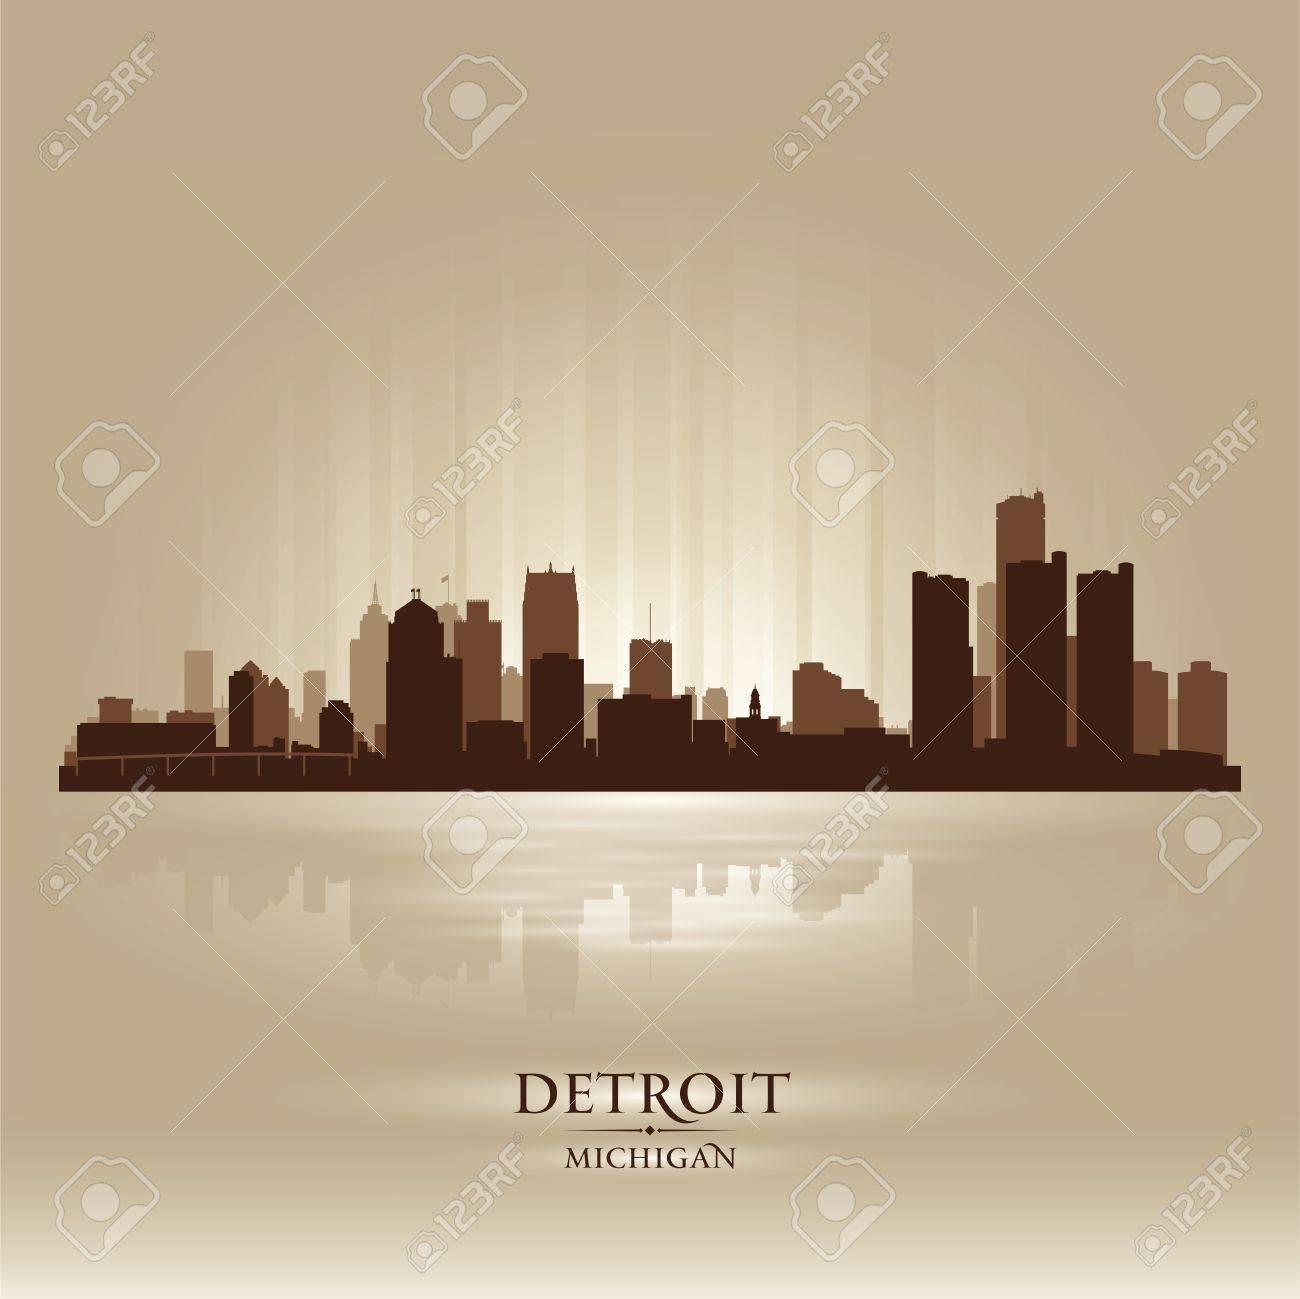 Detroit Michigan city skyline silhouette. Vector illustration Stock Vector - 18671024